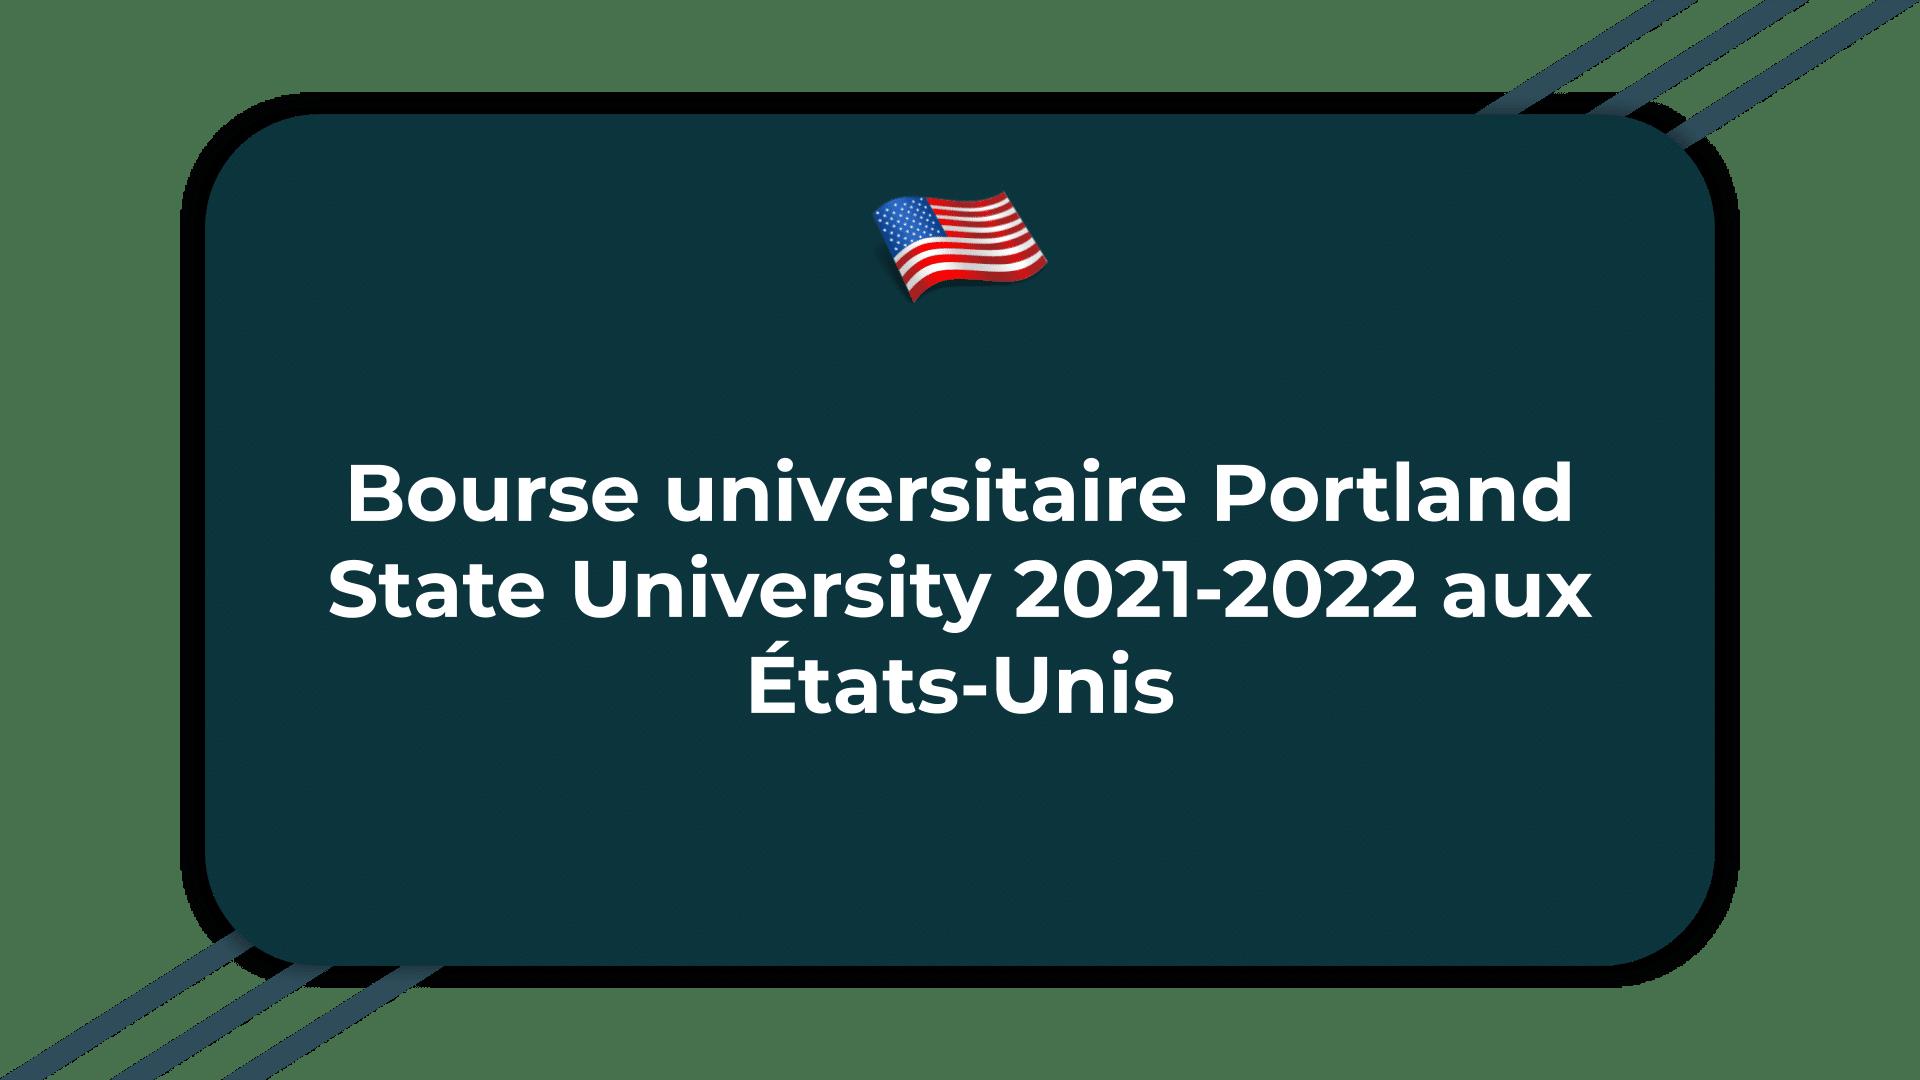 Bourse universitaire Portland State University